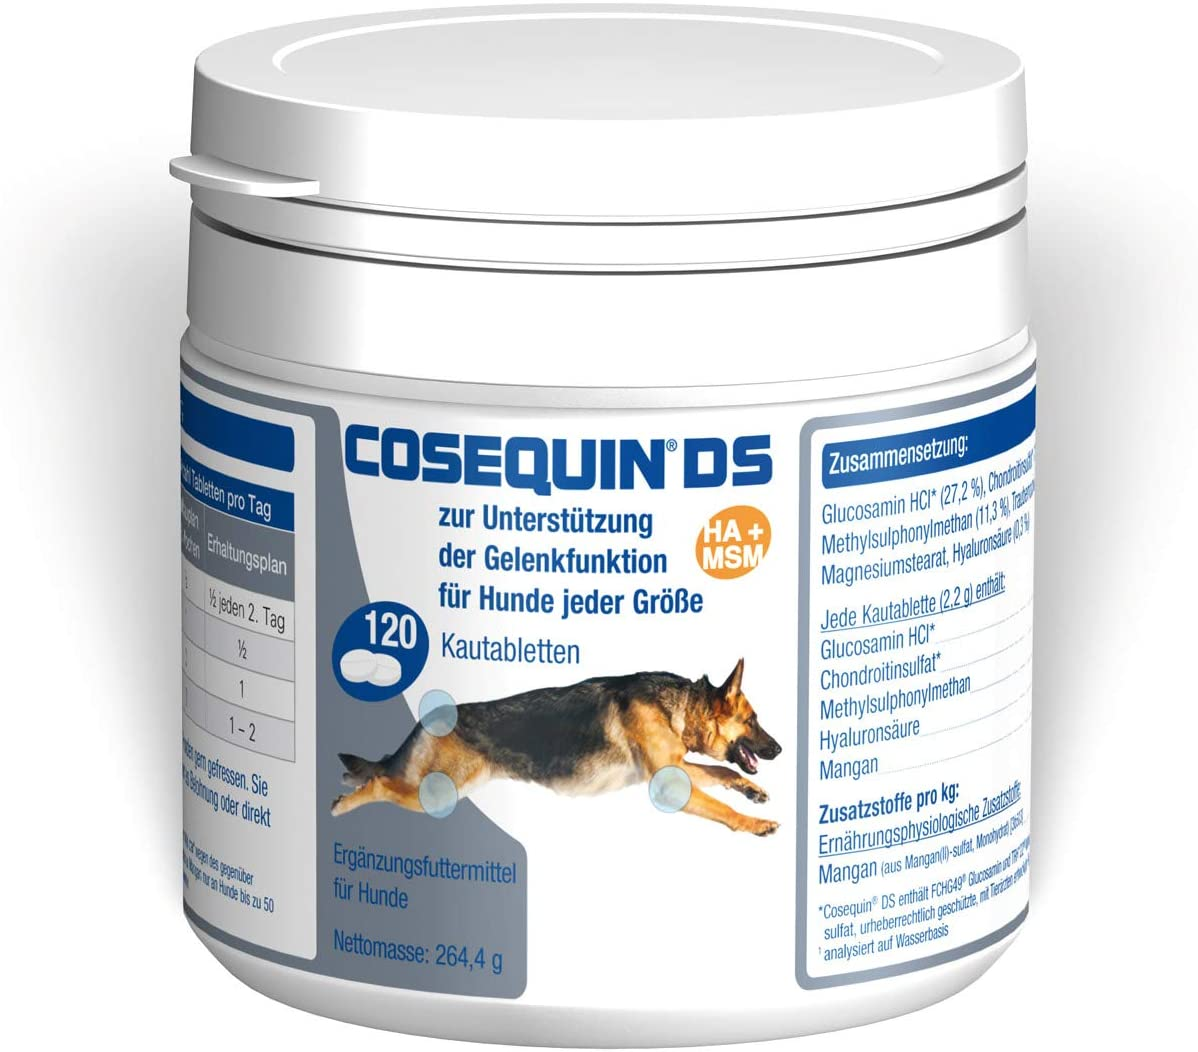 Ecuphar Cosequin DS HA+MSM 120 - Bandeja masticable para perros